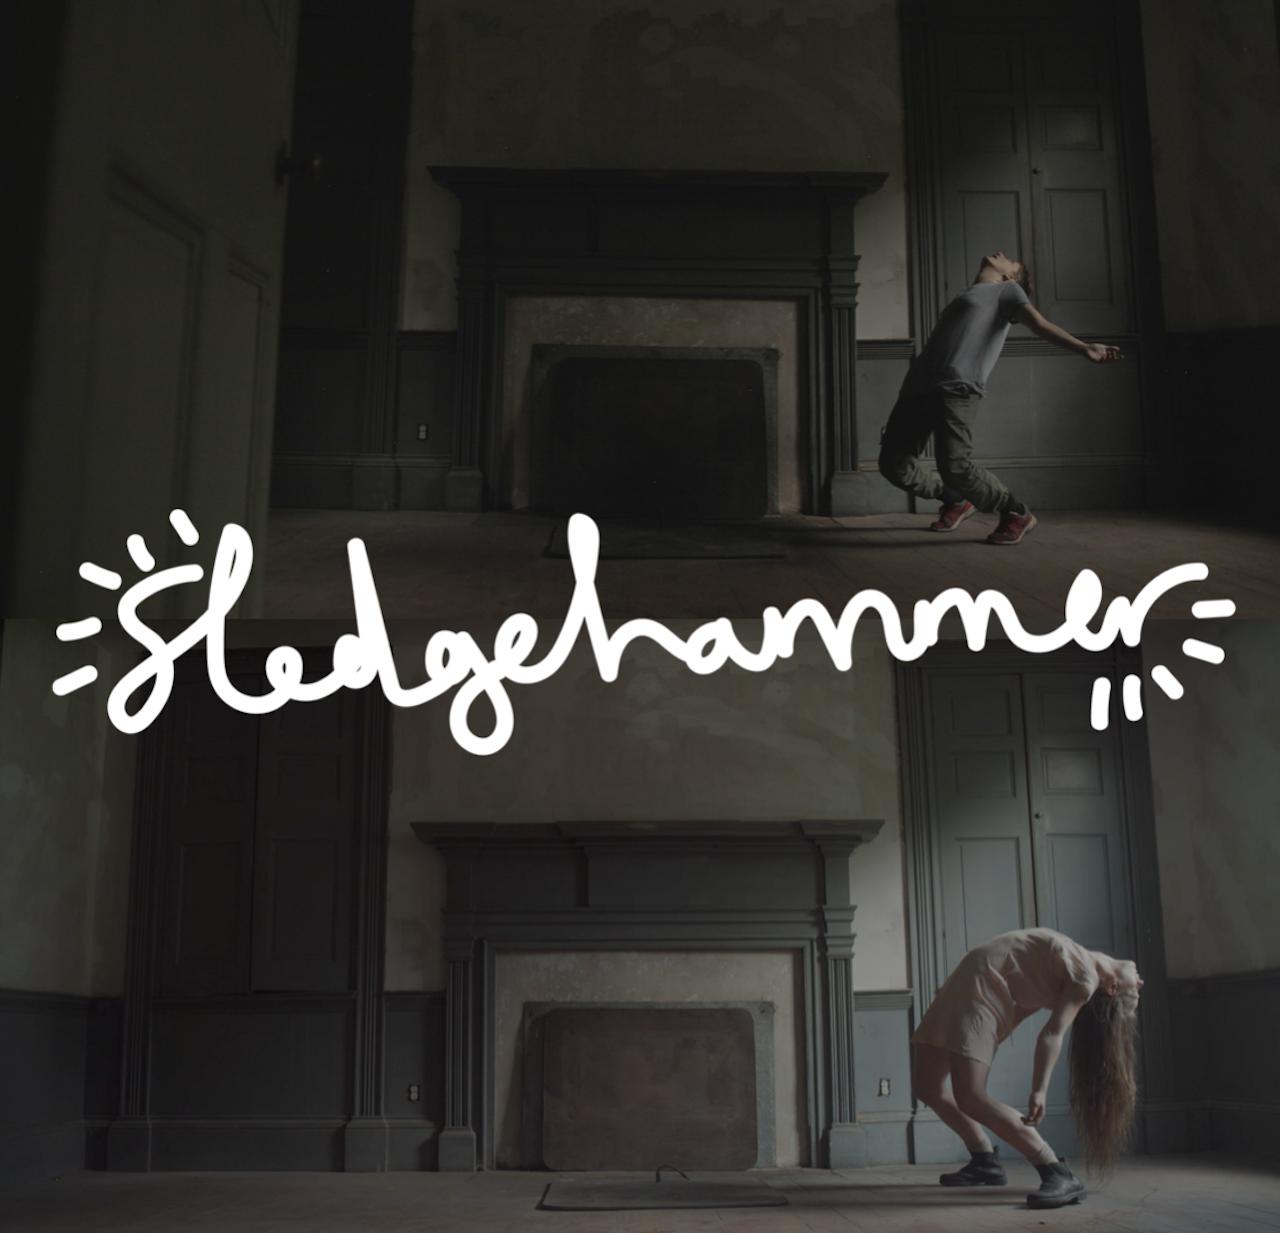 Adi Halfin shows 'True Love Waits' and its story at Sledgehammer.